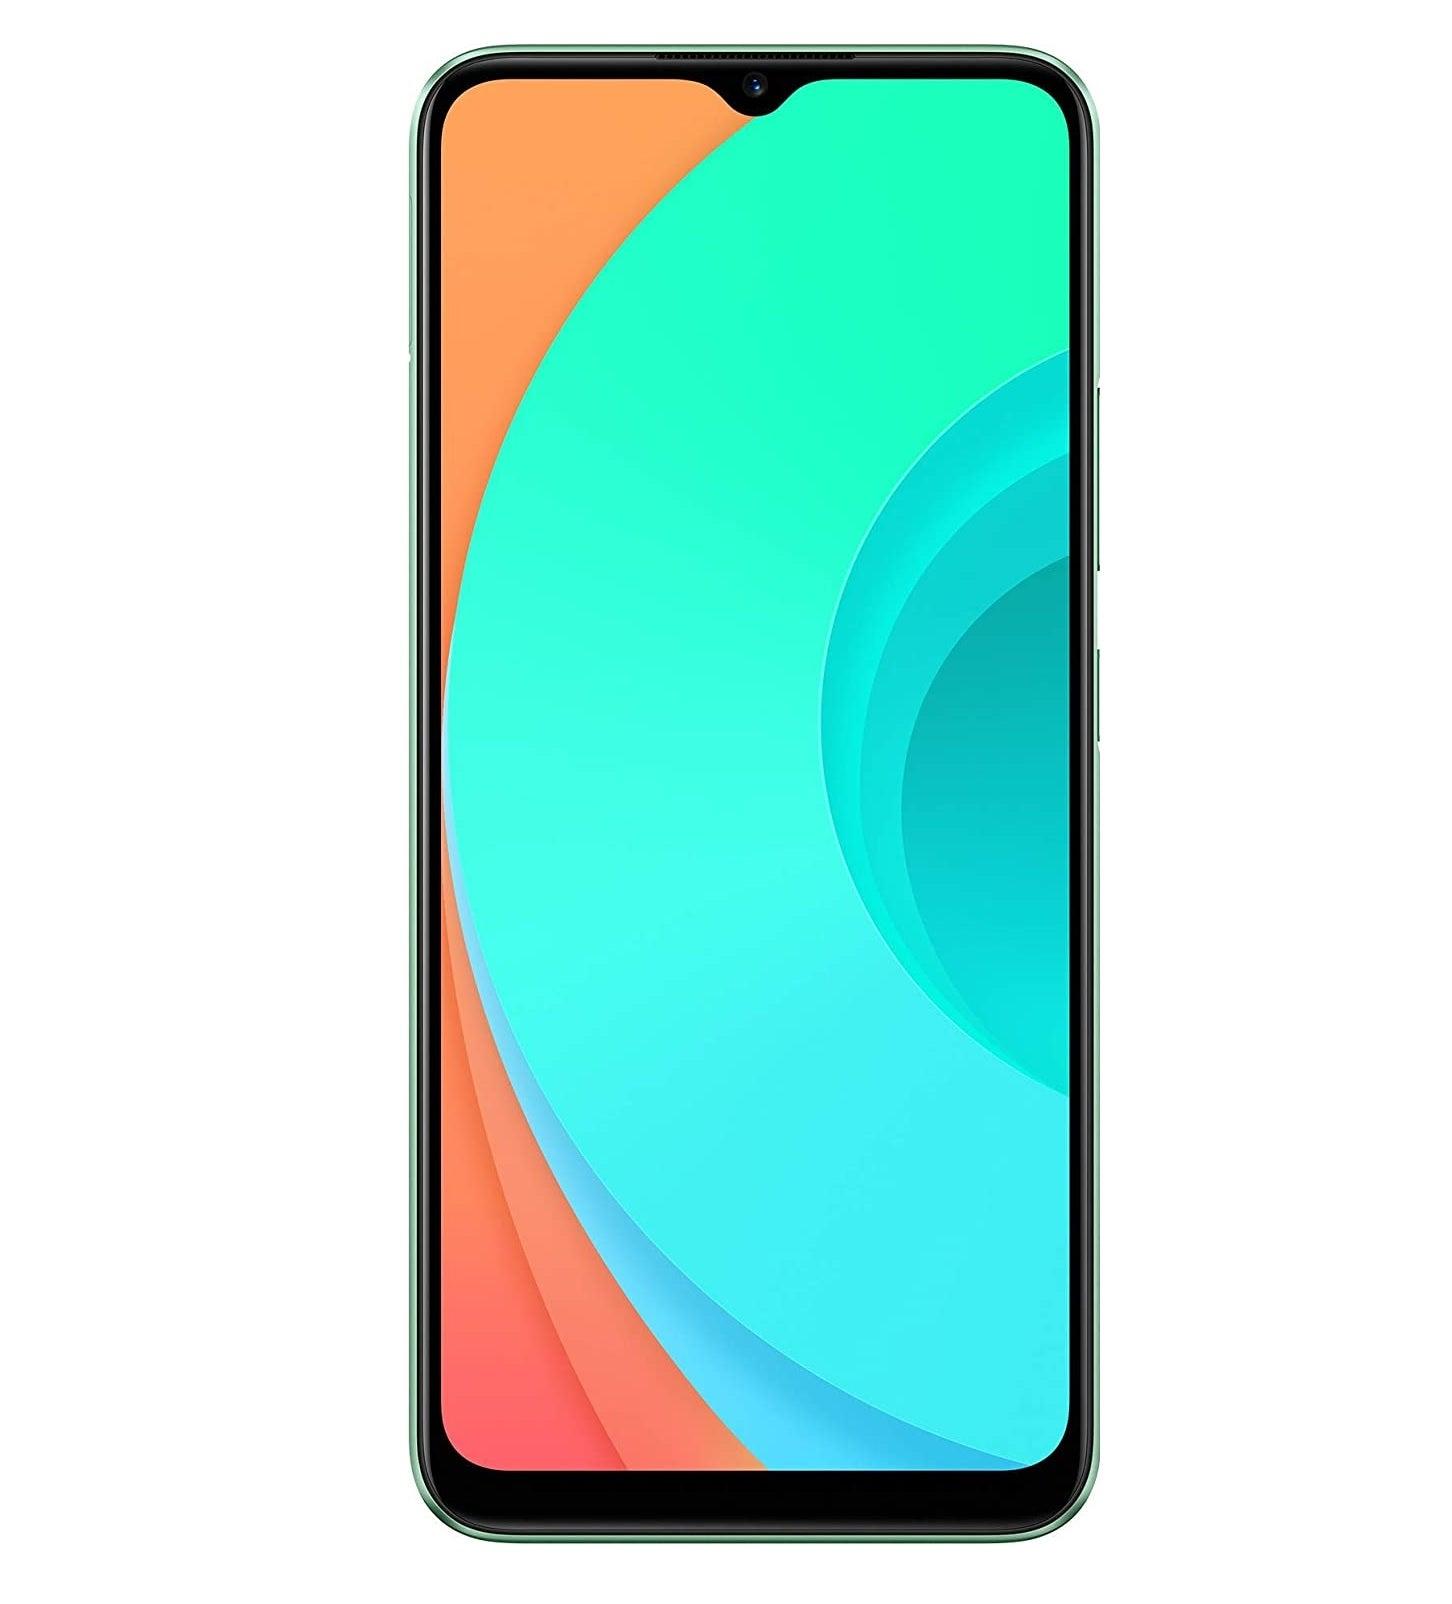 Realme C11 4G Mobile Phone